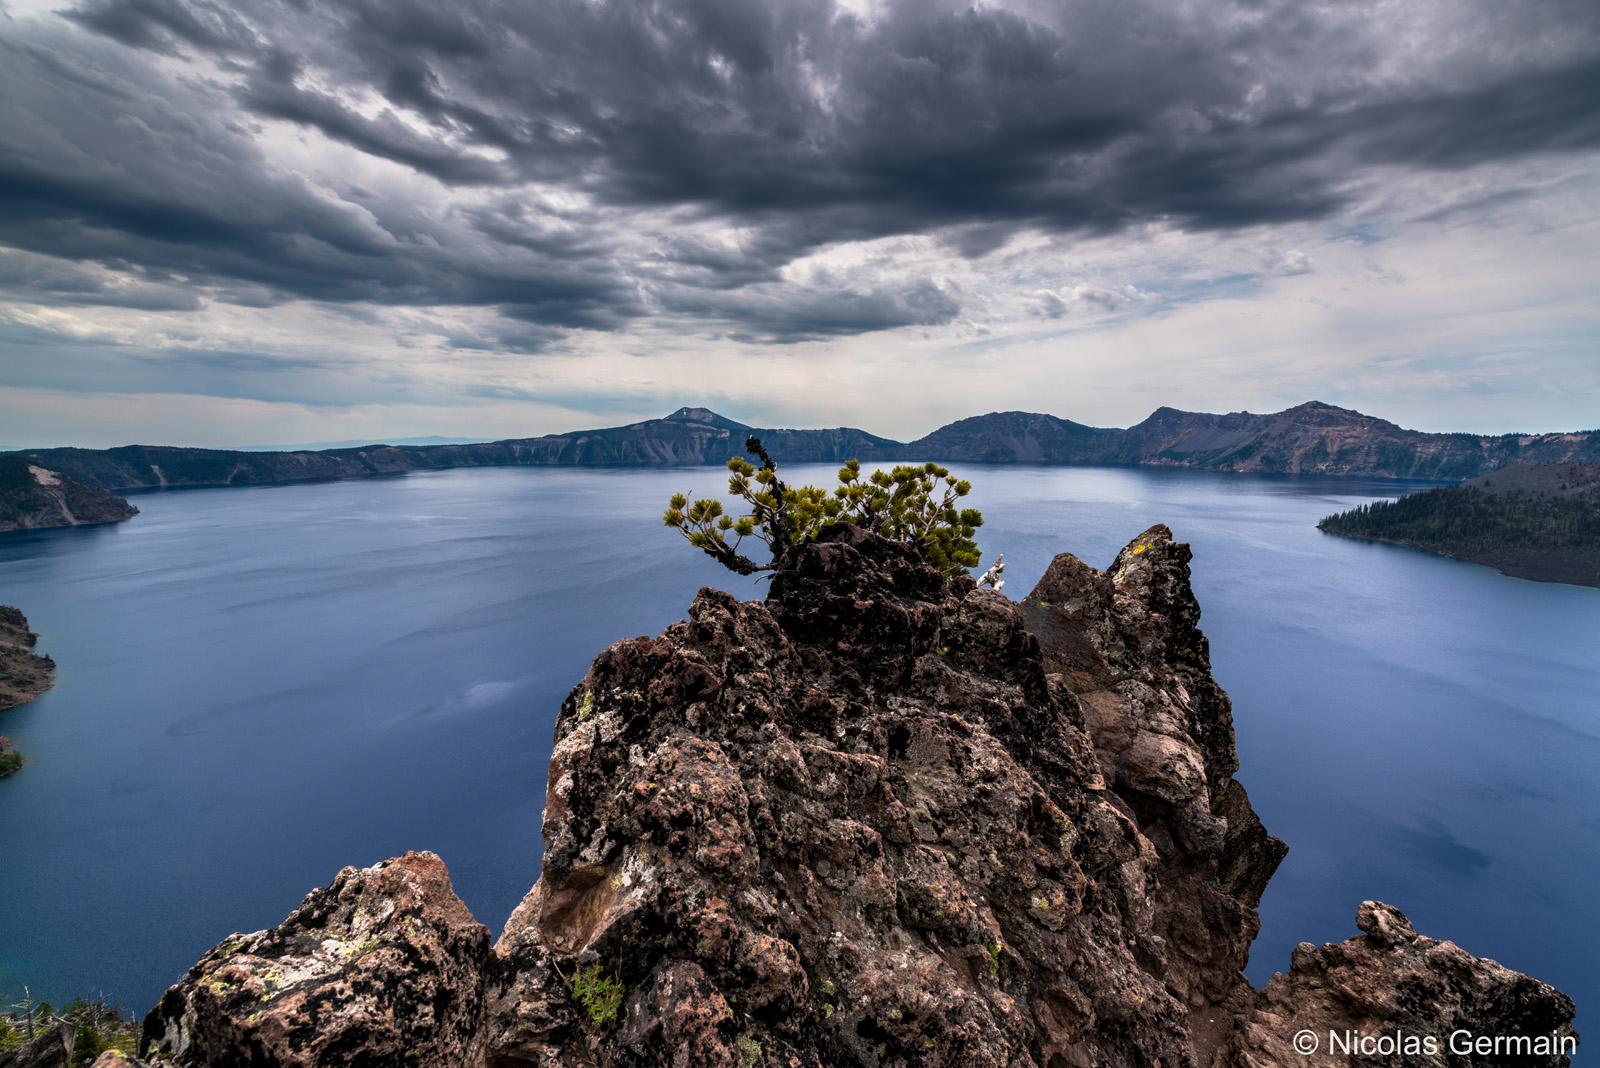 Ciel menaçant au-dessus de Crater Lake, Oregon